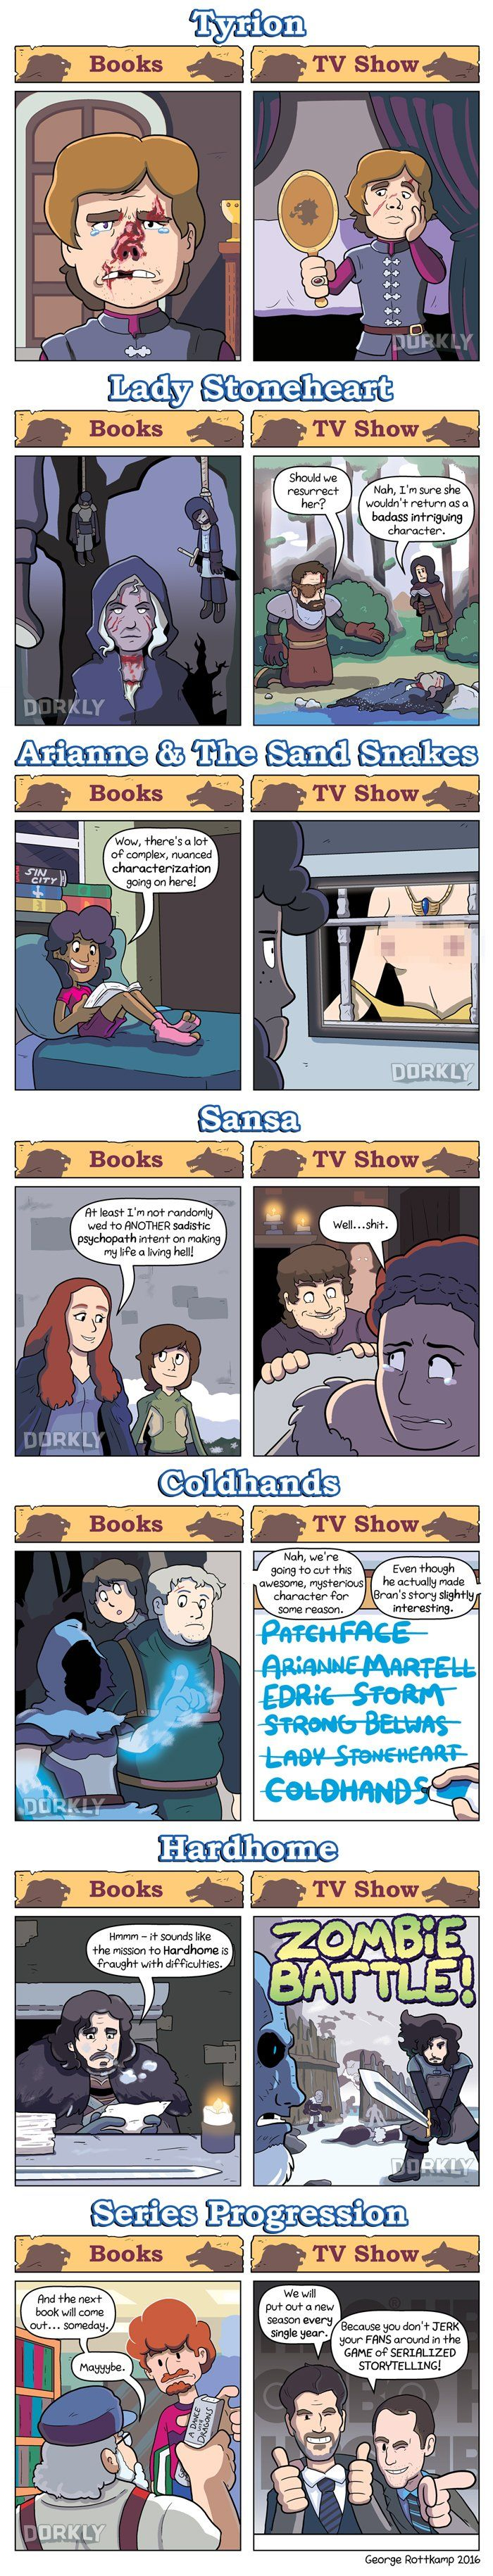 Game of Thrones: Books vs. Show comic full